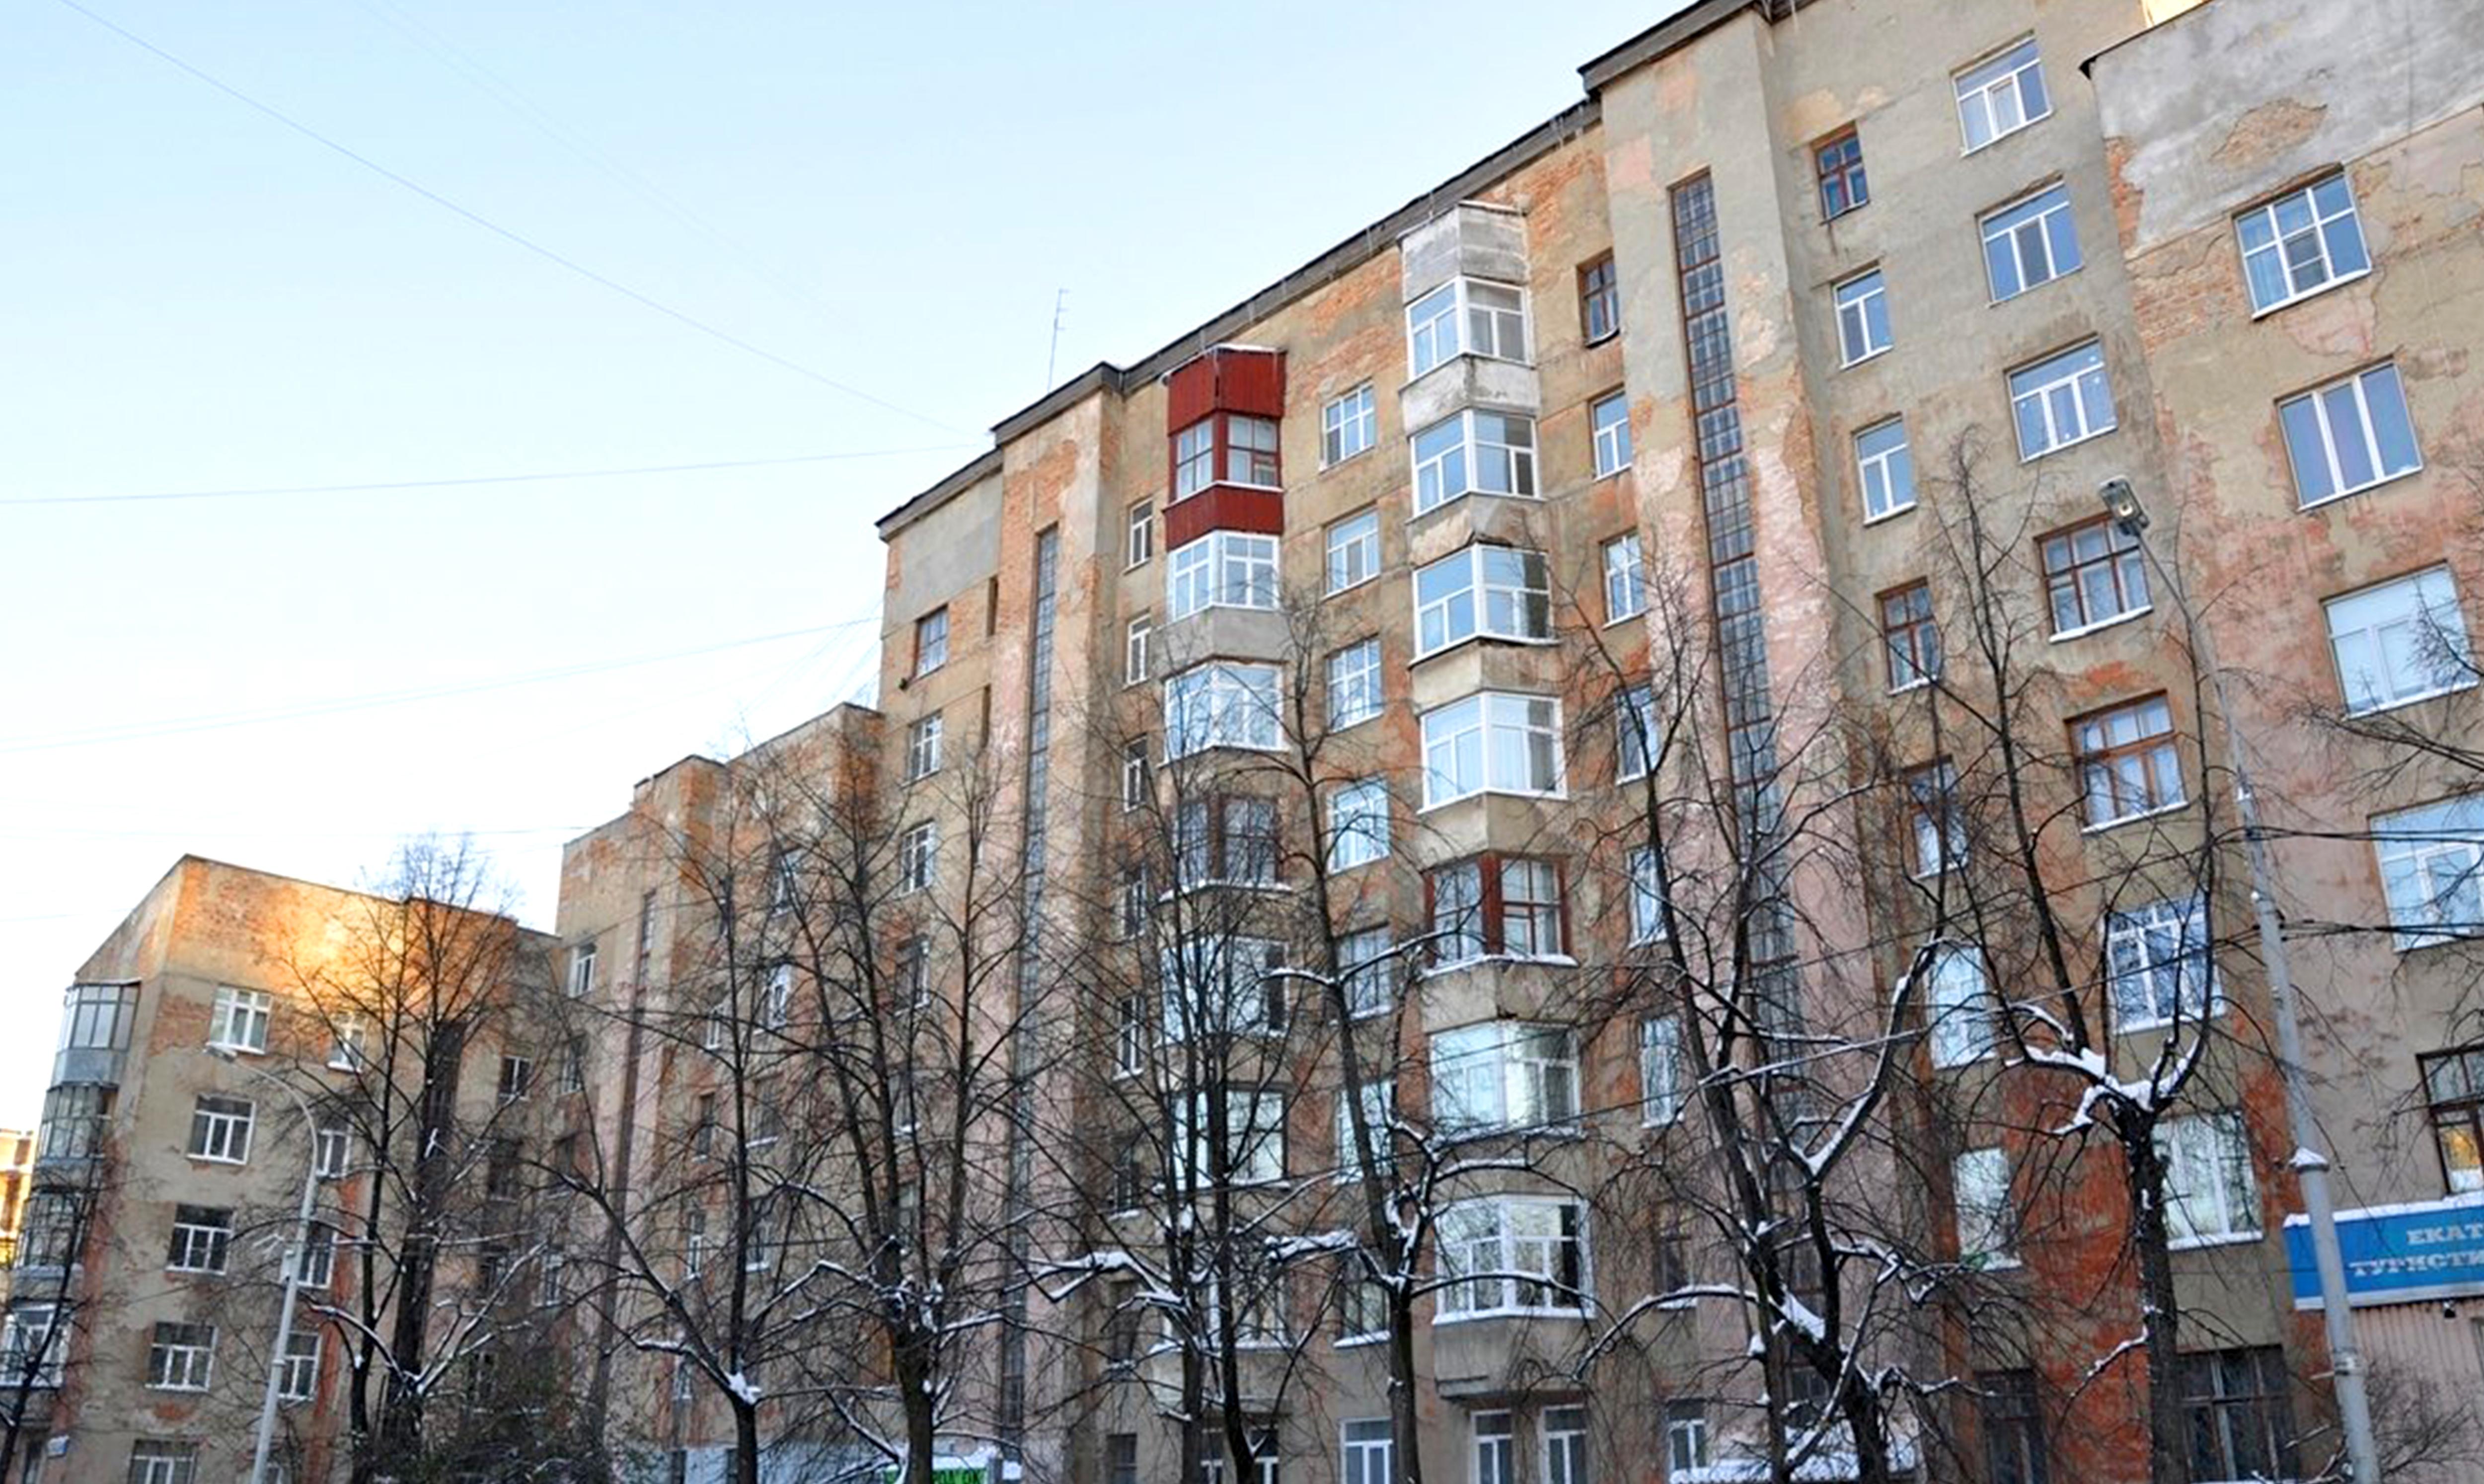 На YouTube появился цикл коротких лекций про конструктивистские городки Екатеринбурга